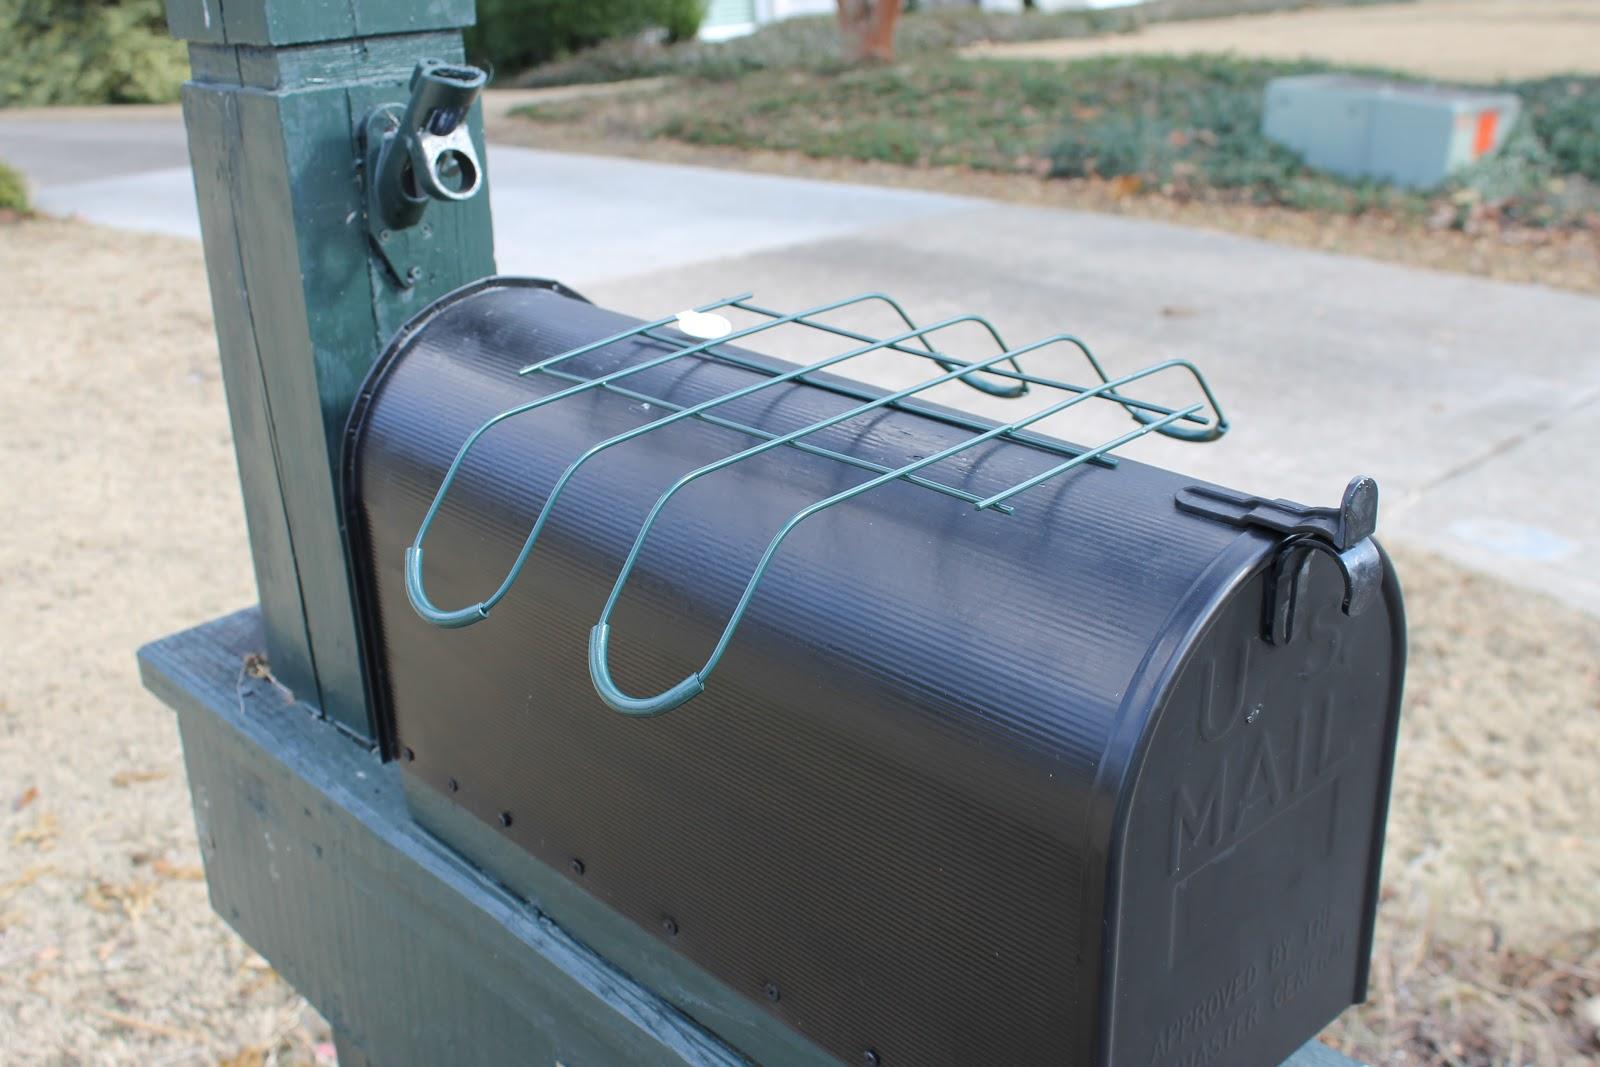 Curly Deco Mesh Mailbox Topper | Miss Kopy Kat